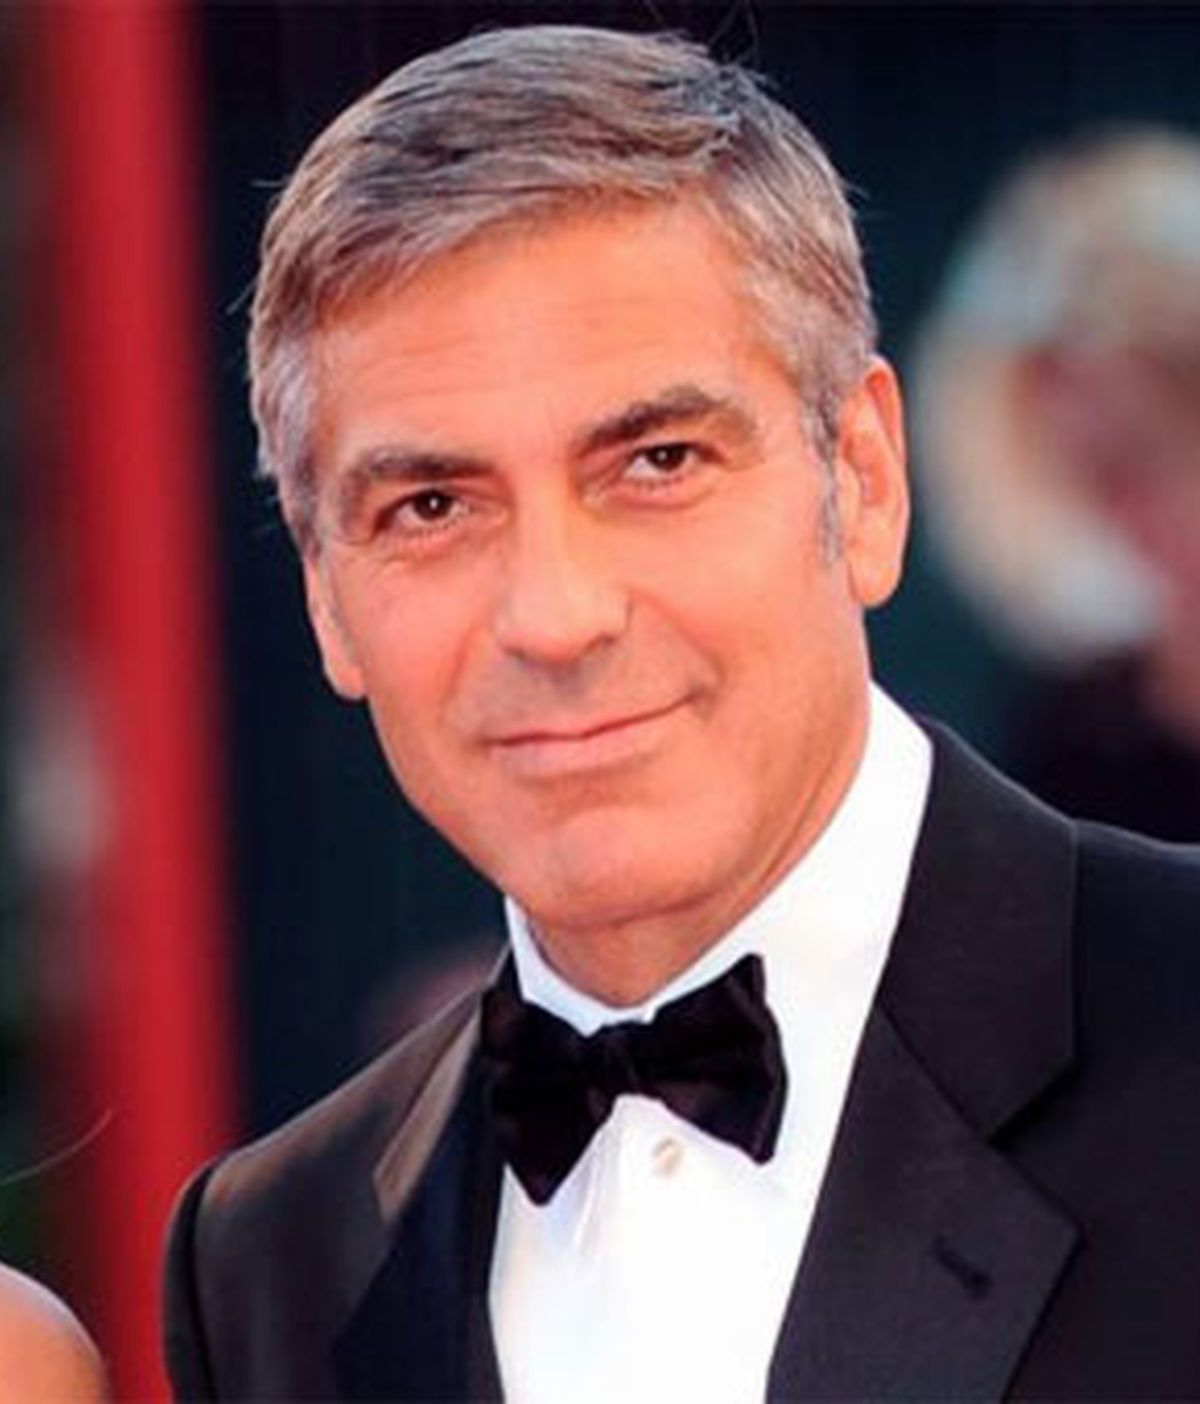 Imagen de archivo de George Clooney. Foto: EFE